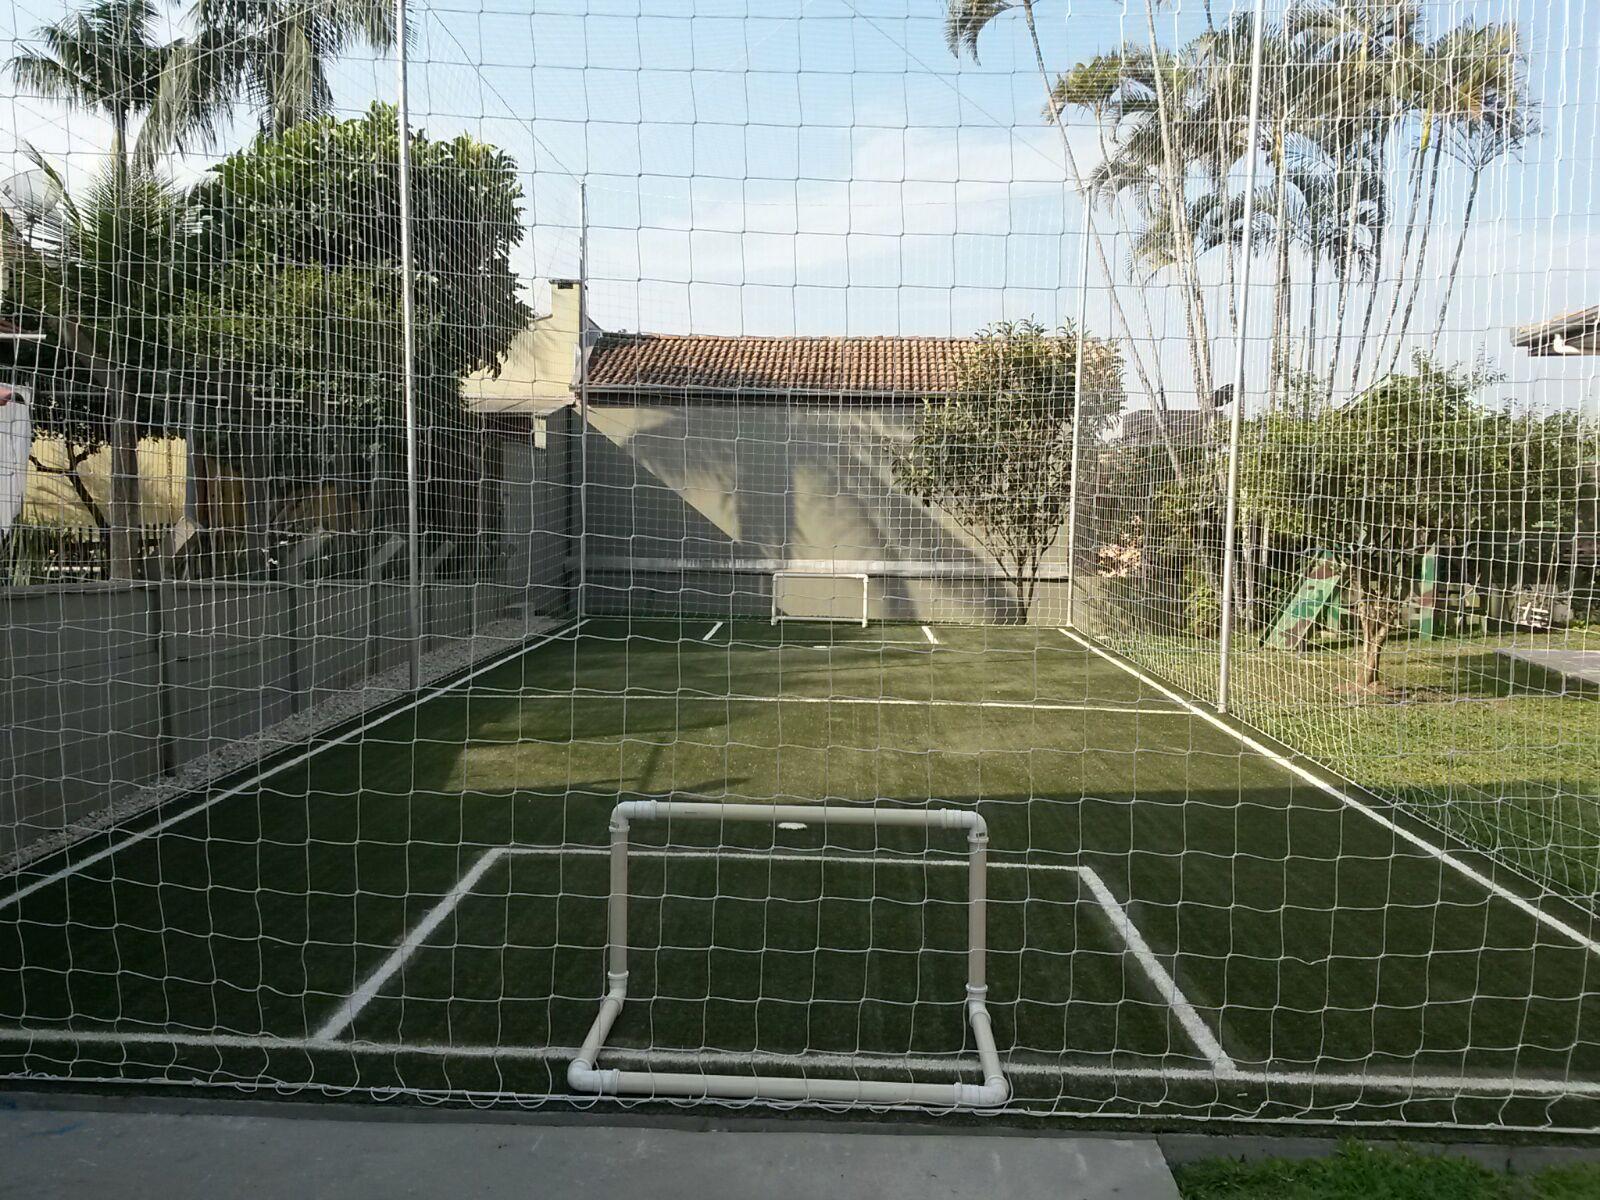 Quadrinha de grama sintética - Blumenau / Santa Catarina